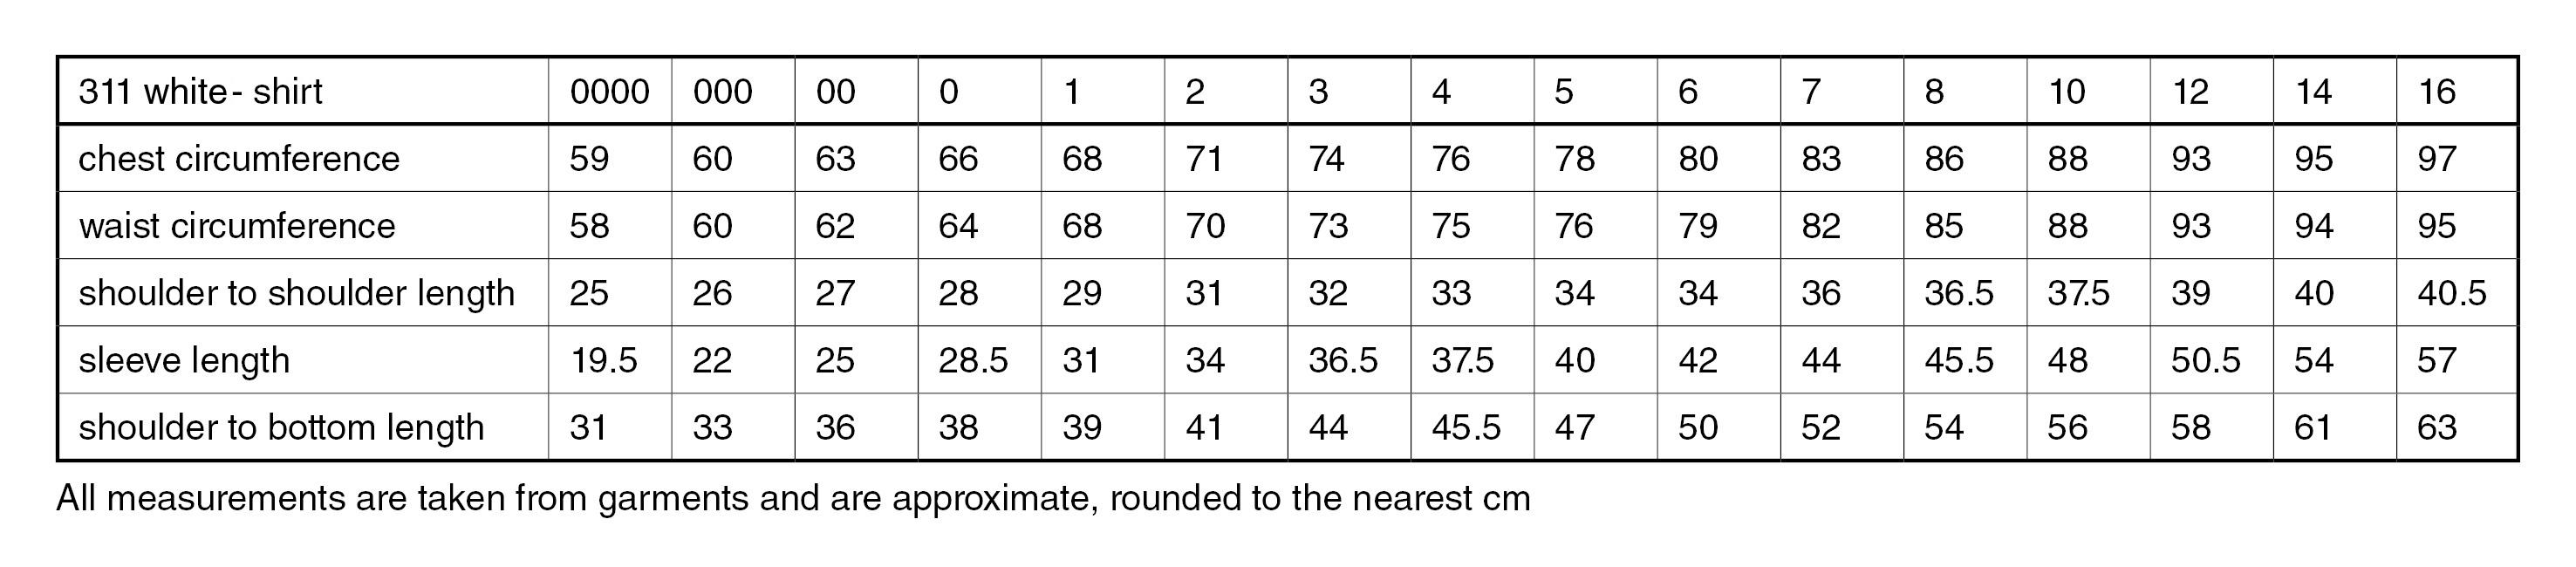 311 Measurement